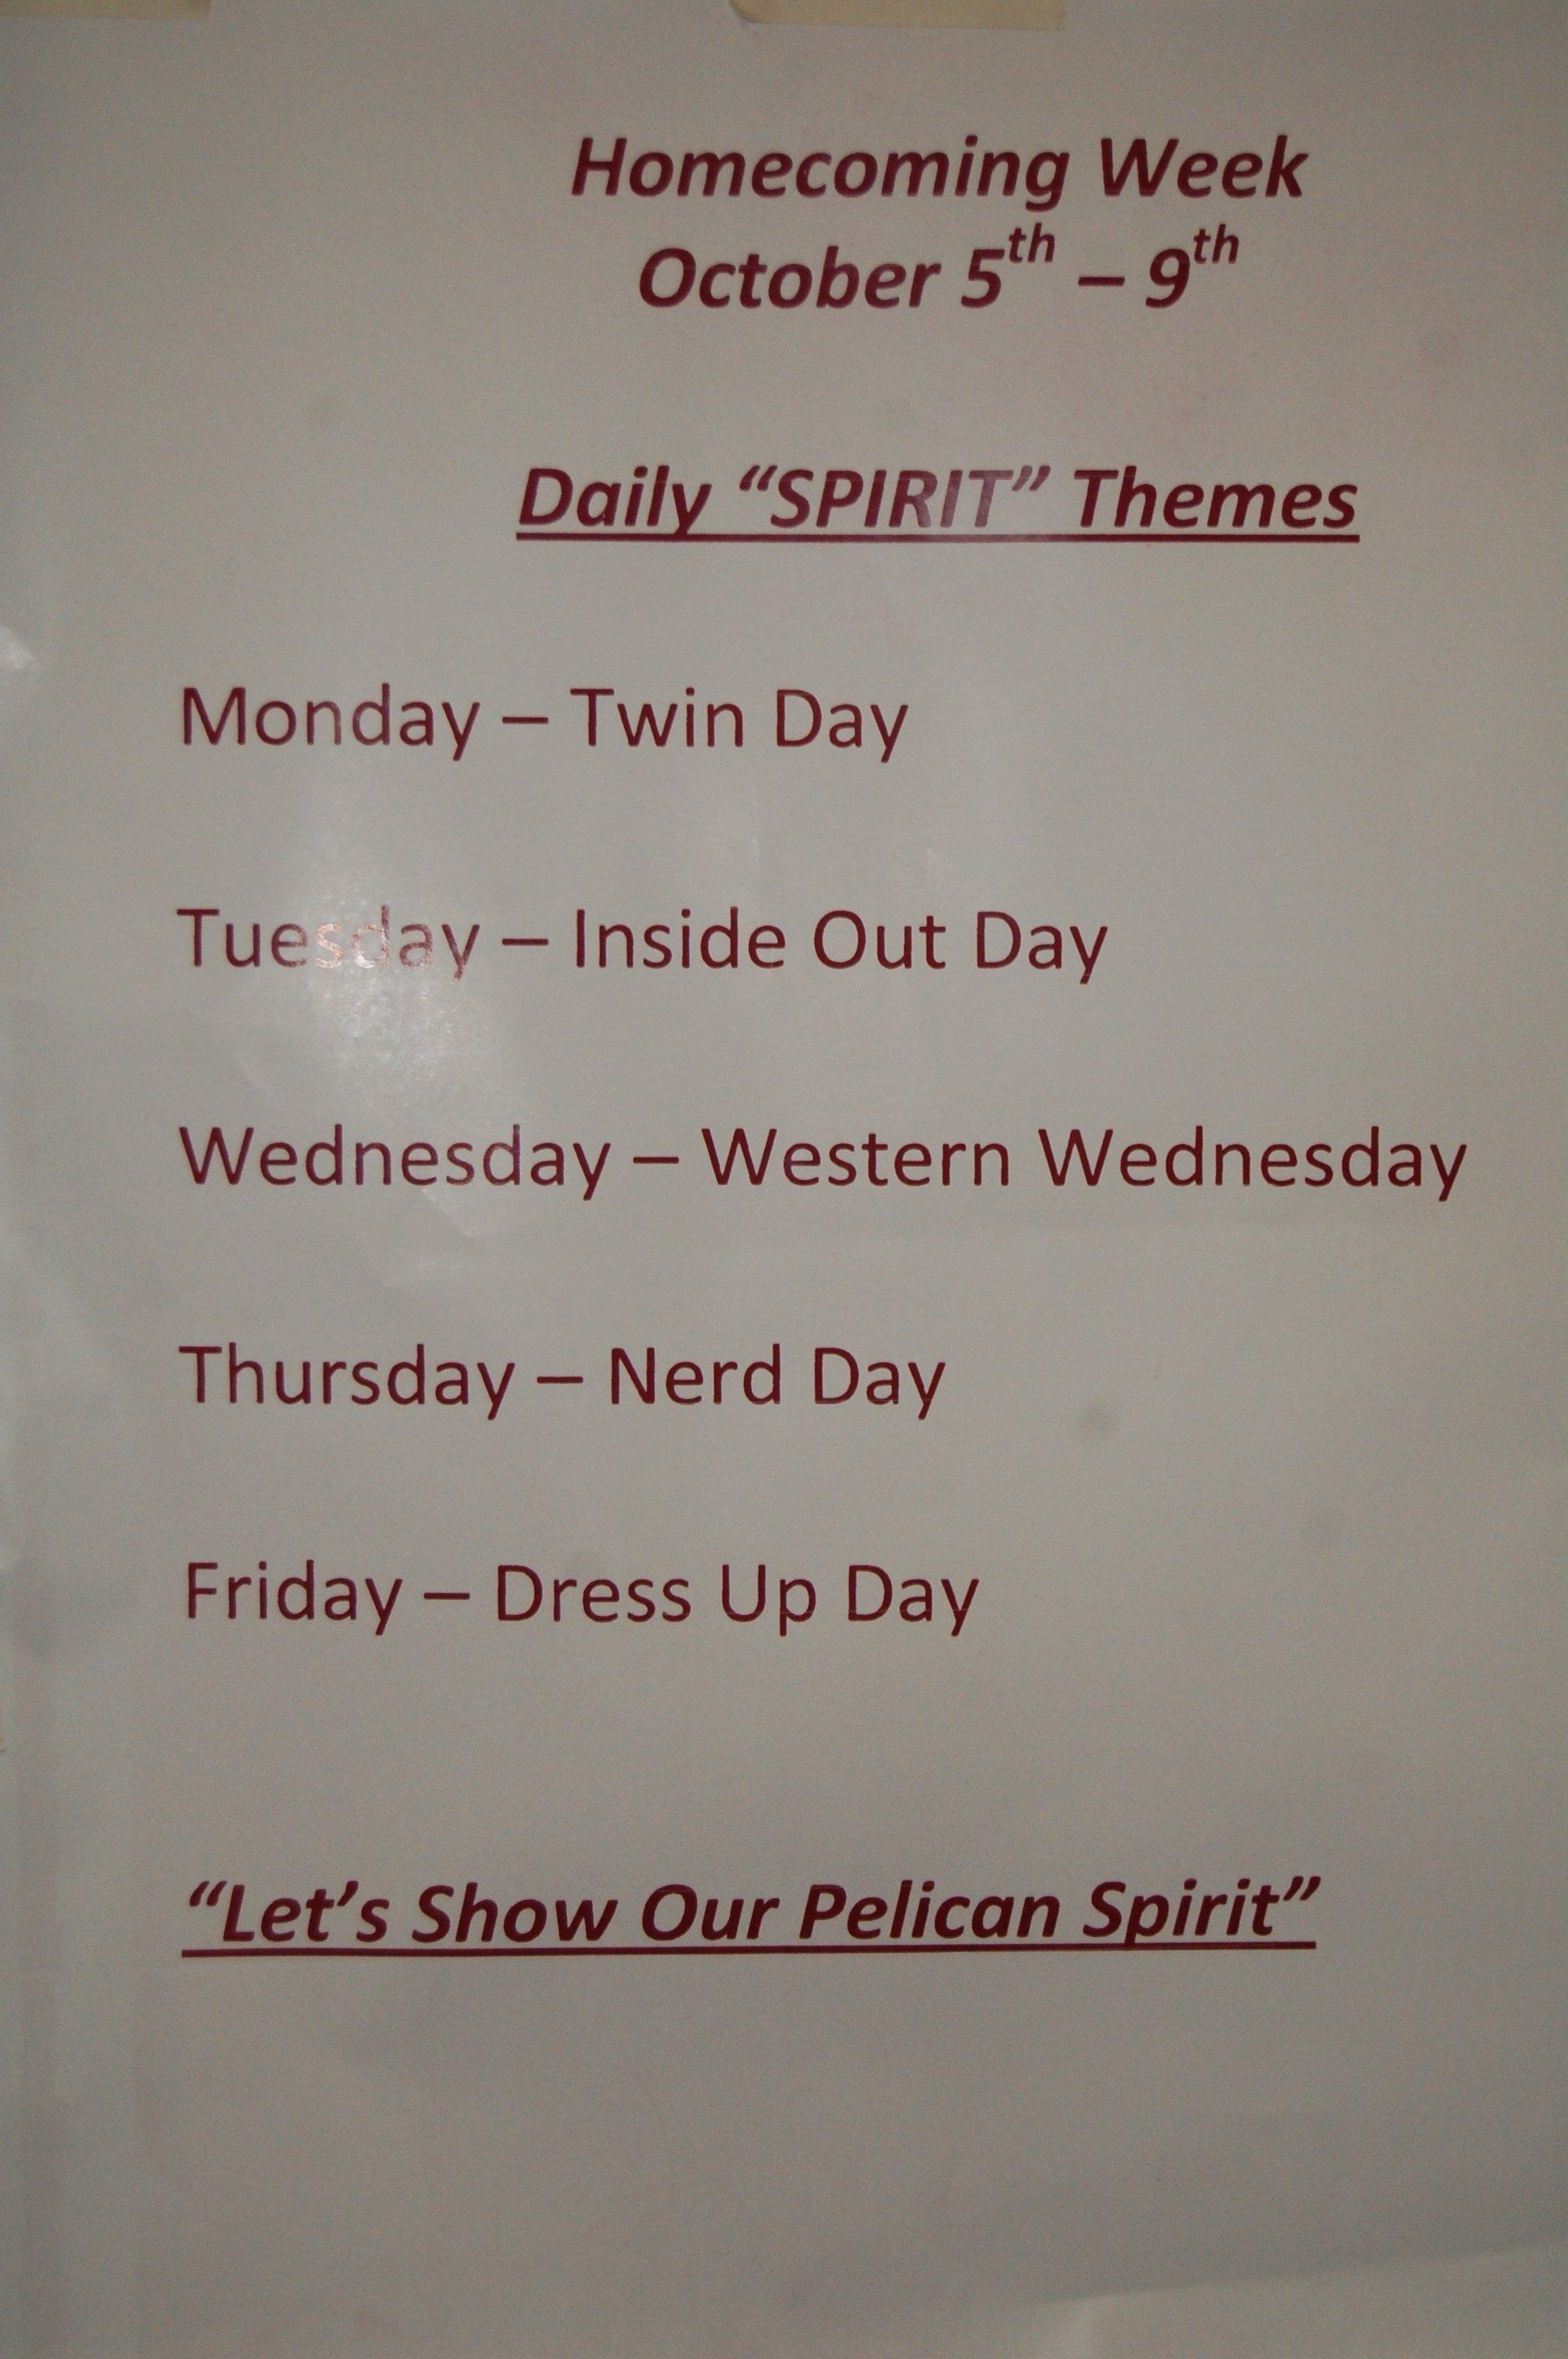 10 Perfect Homecoming Week Dress Up Ideas homecoming week student photos homer high school 2021